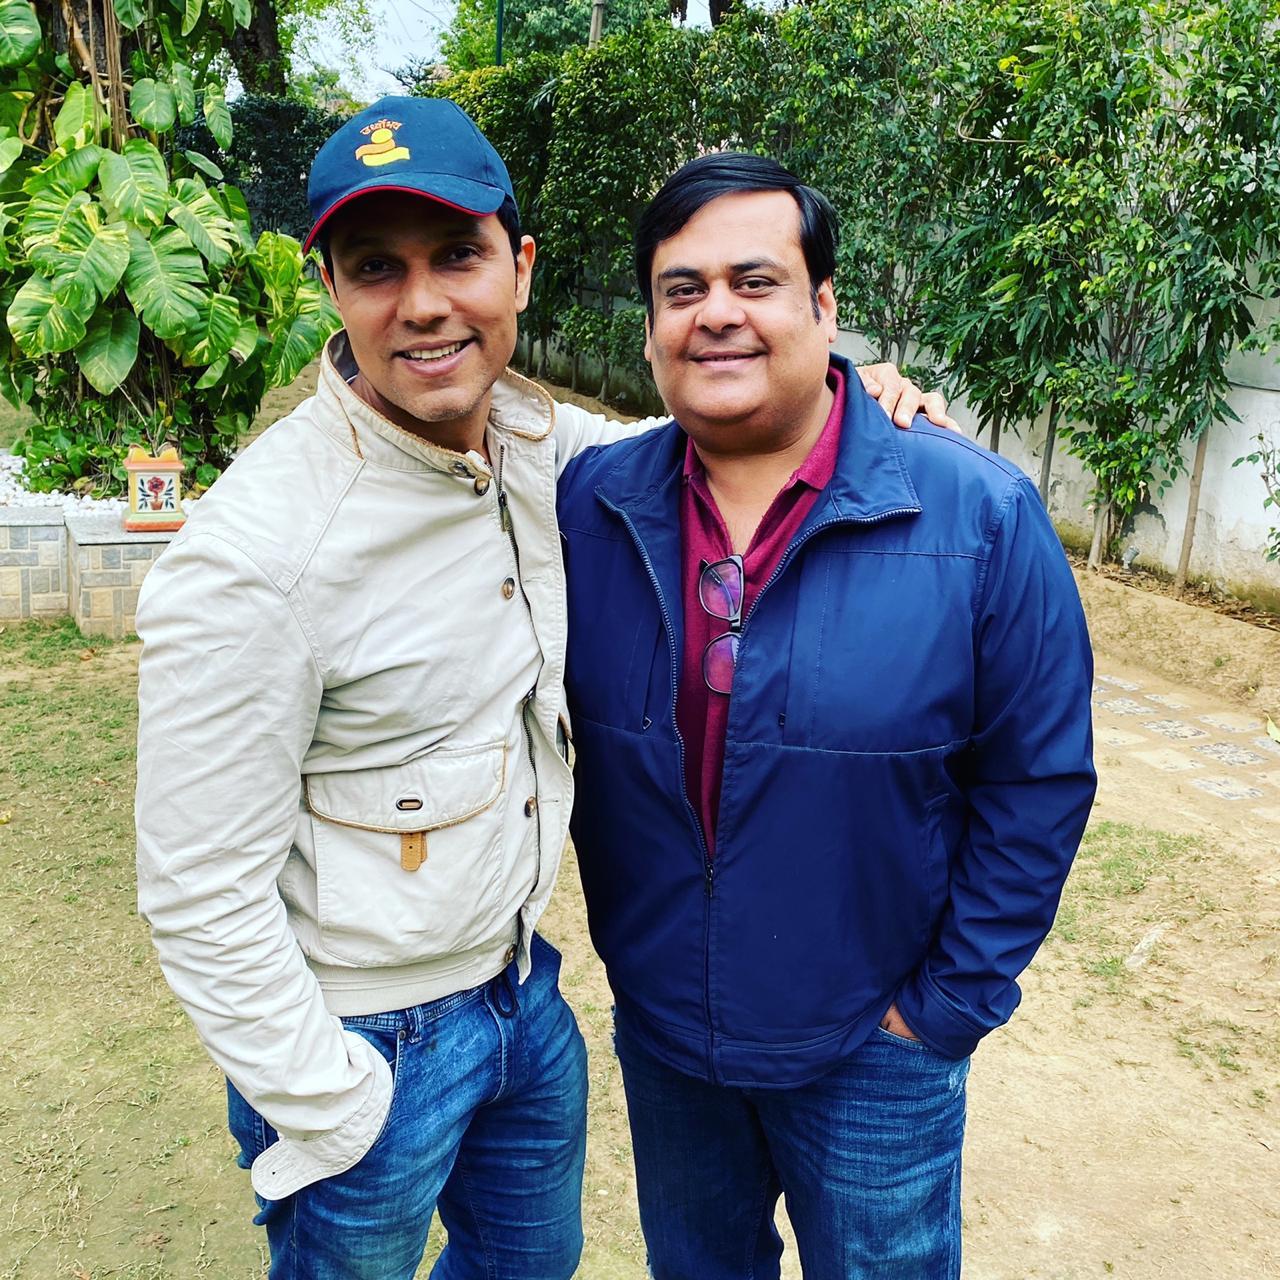 Rahul Mittra offers gratitude as Saheb Biwi Aur Gangster